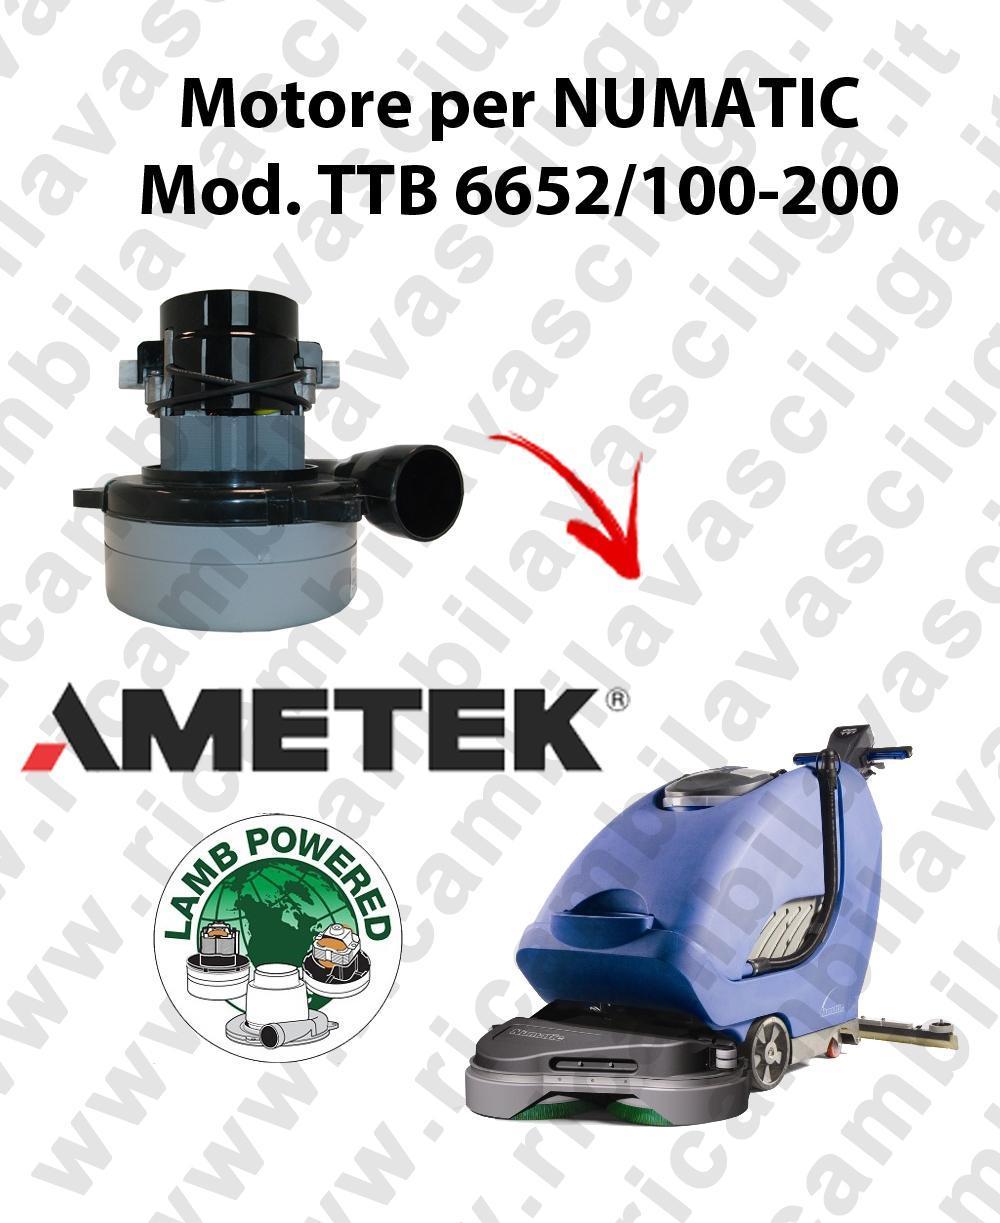 TTB 6652/100-200 Ametek Vacuum Motor scrubber dryer NUMATIC